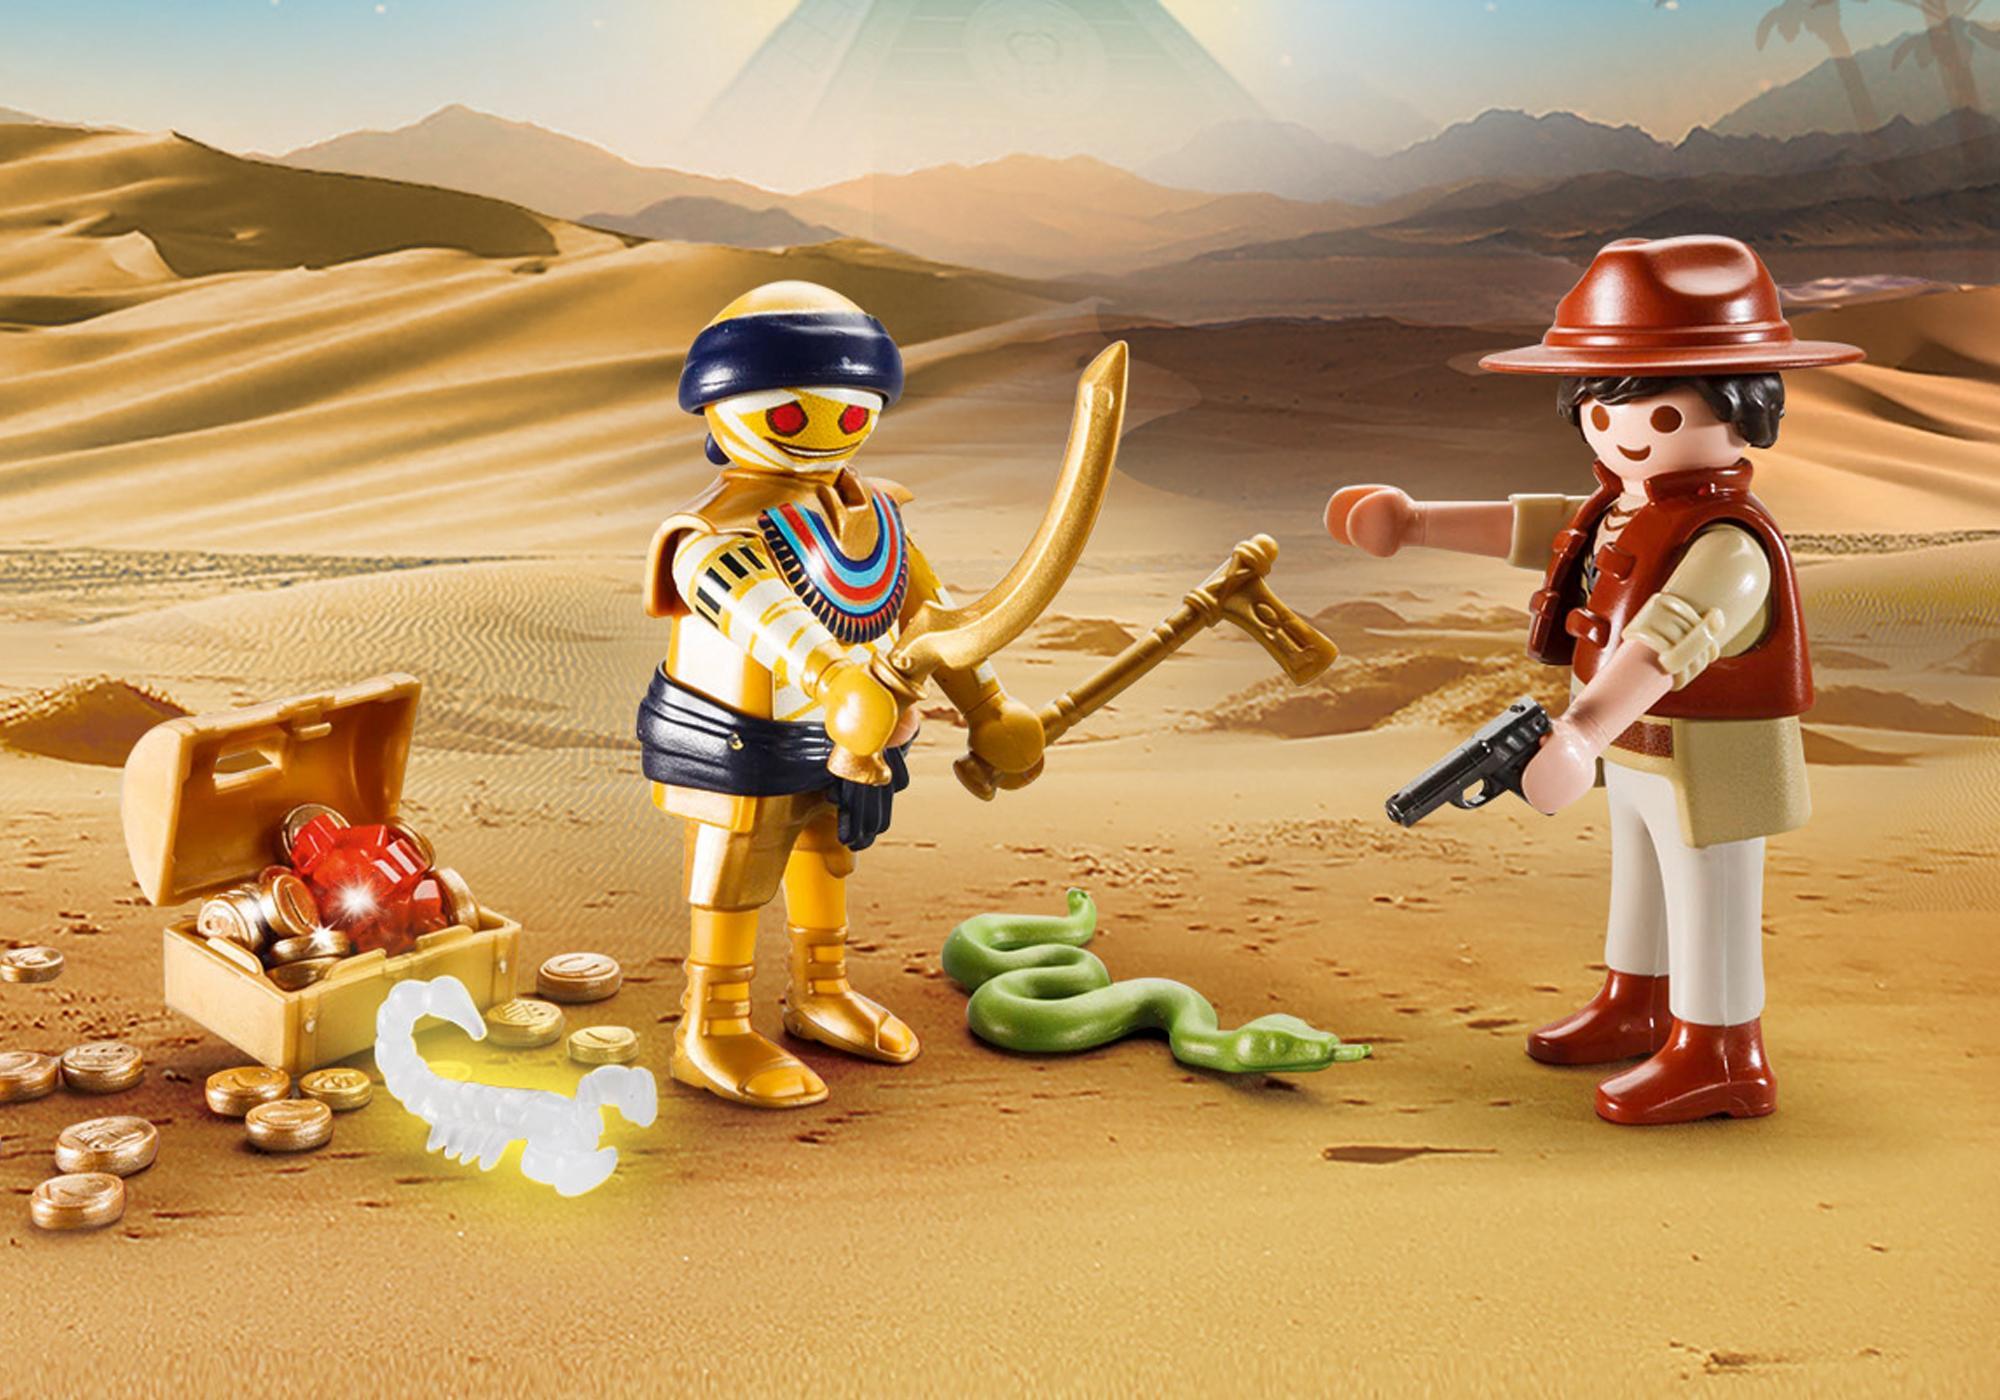 http://media.playmobil.com/i/playmobil/9311_product_extra1/Egyptian Tomb Play Box